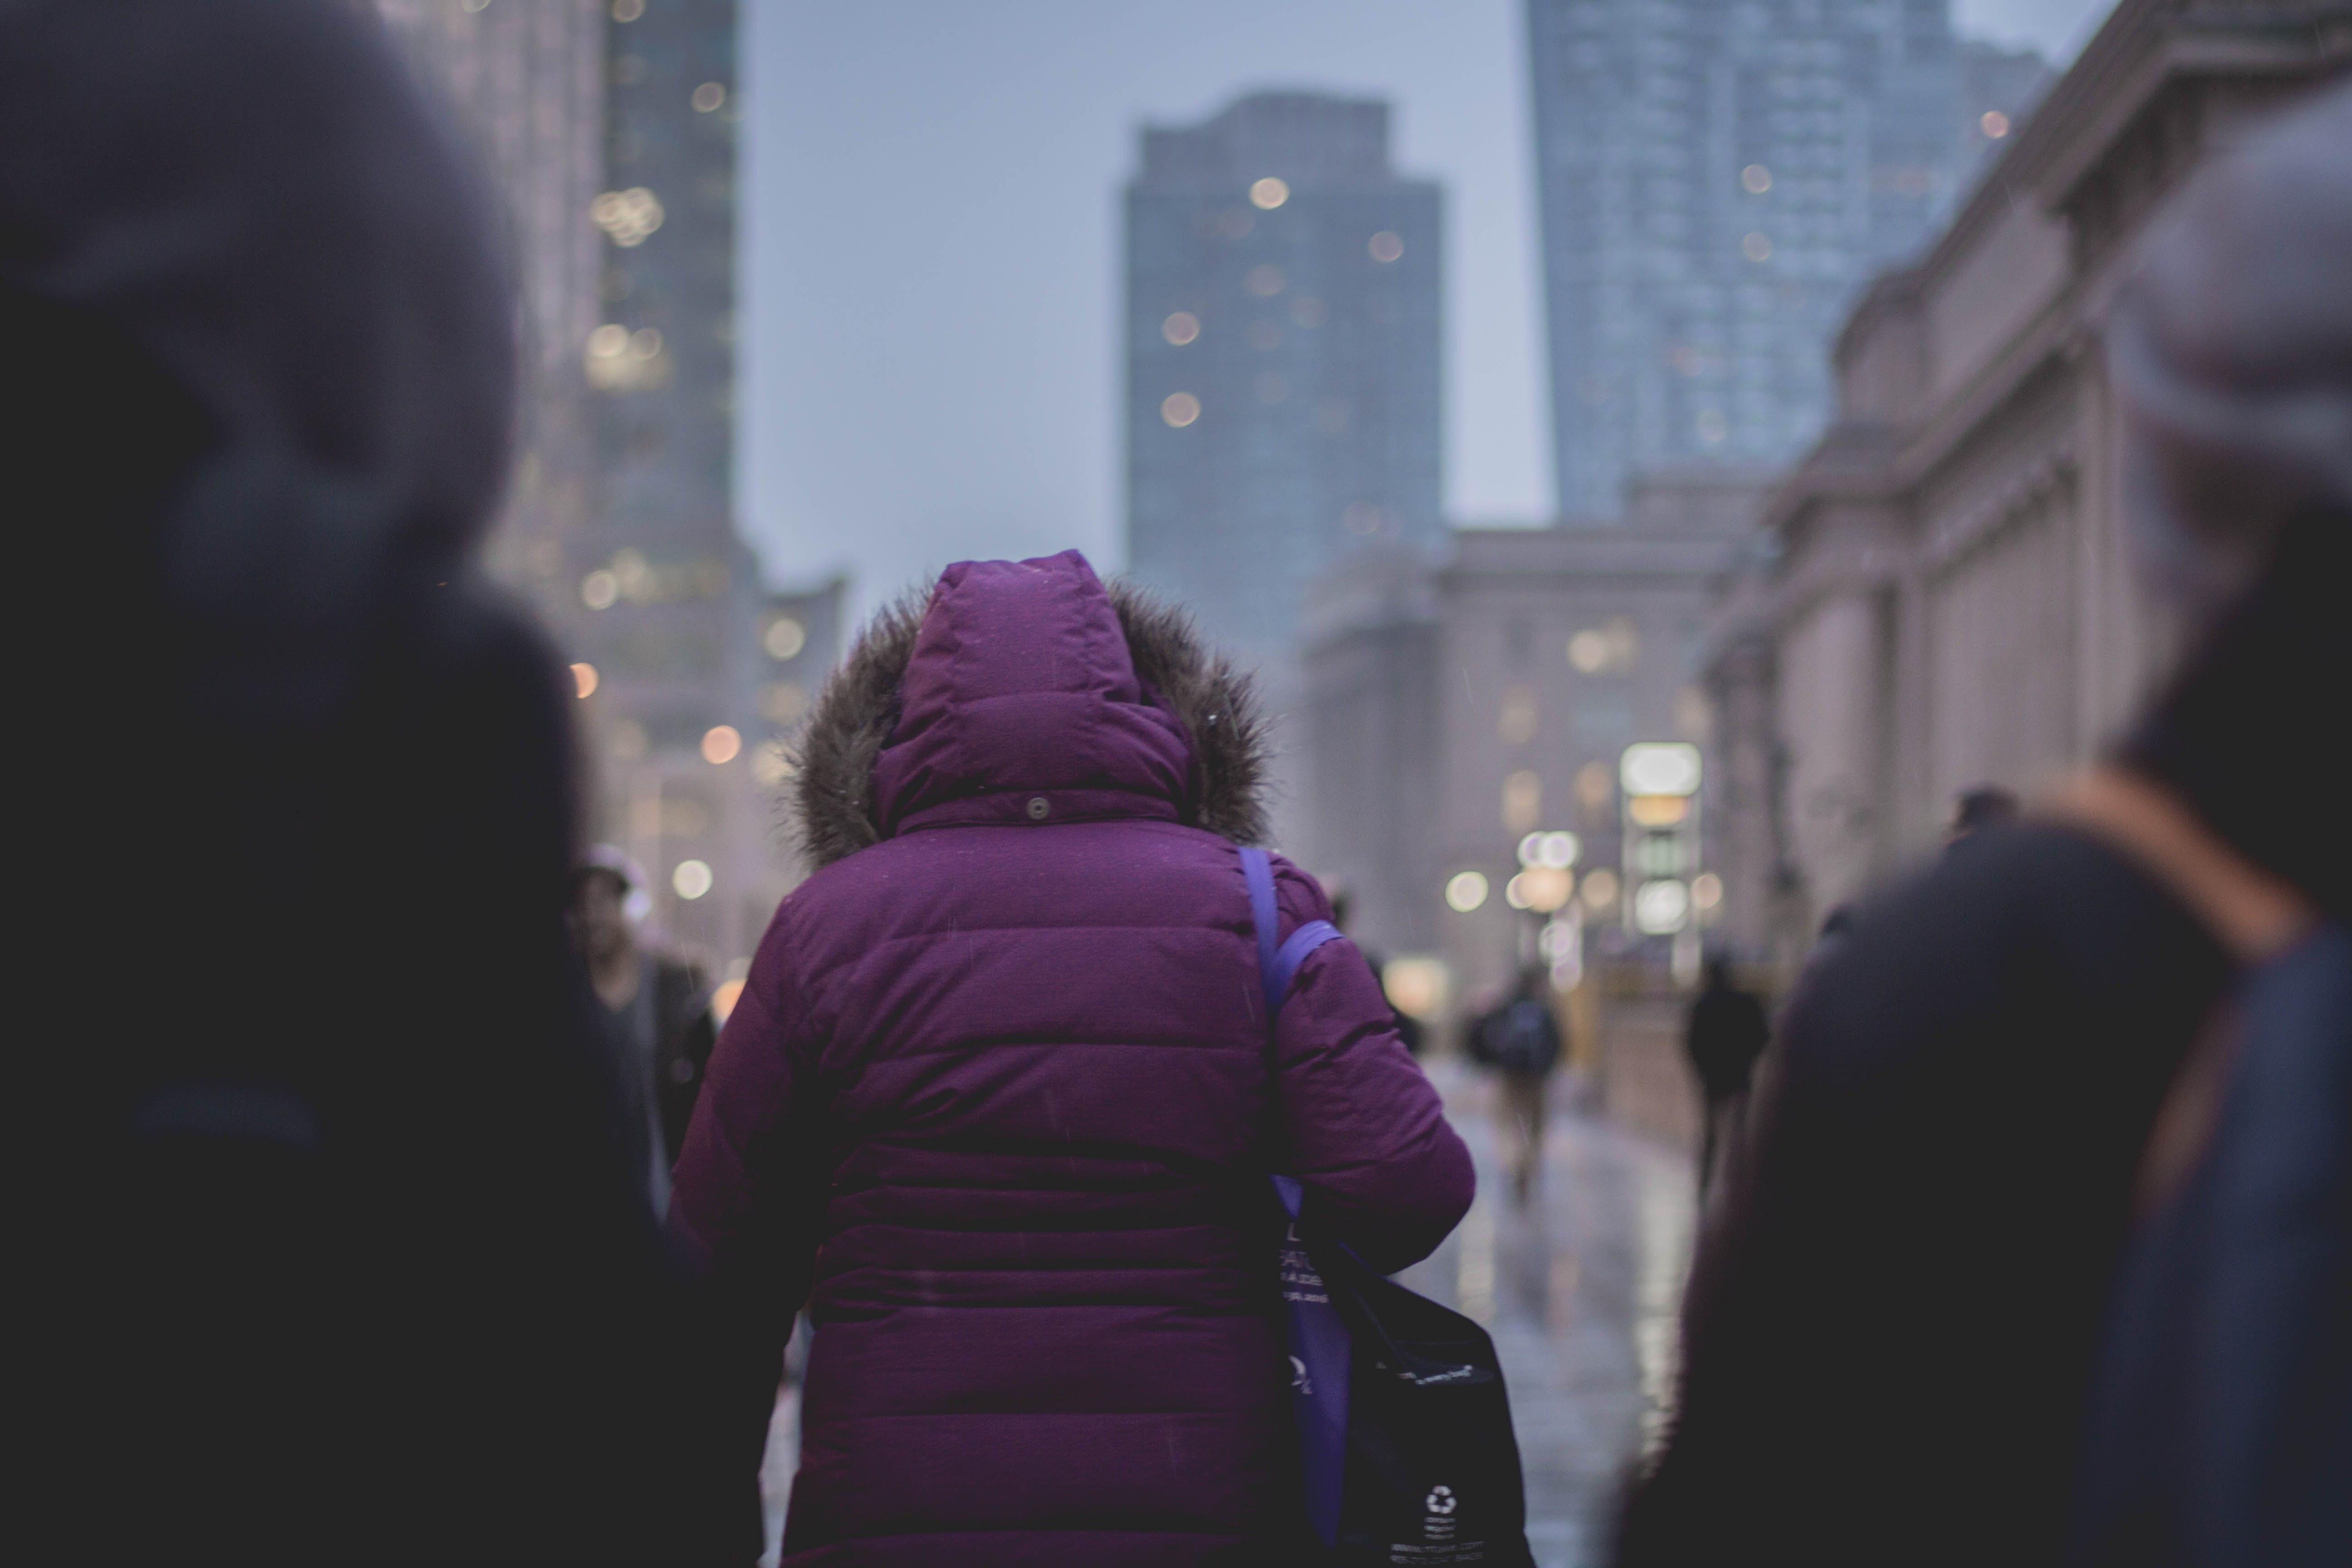 Selective Focus Photograph of Person Wearing Purple Hoodie Jacket Walking on Street